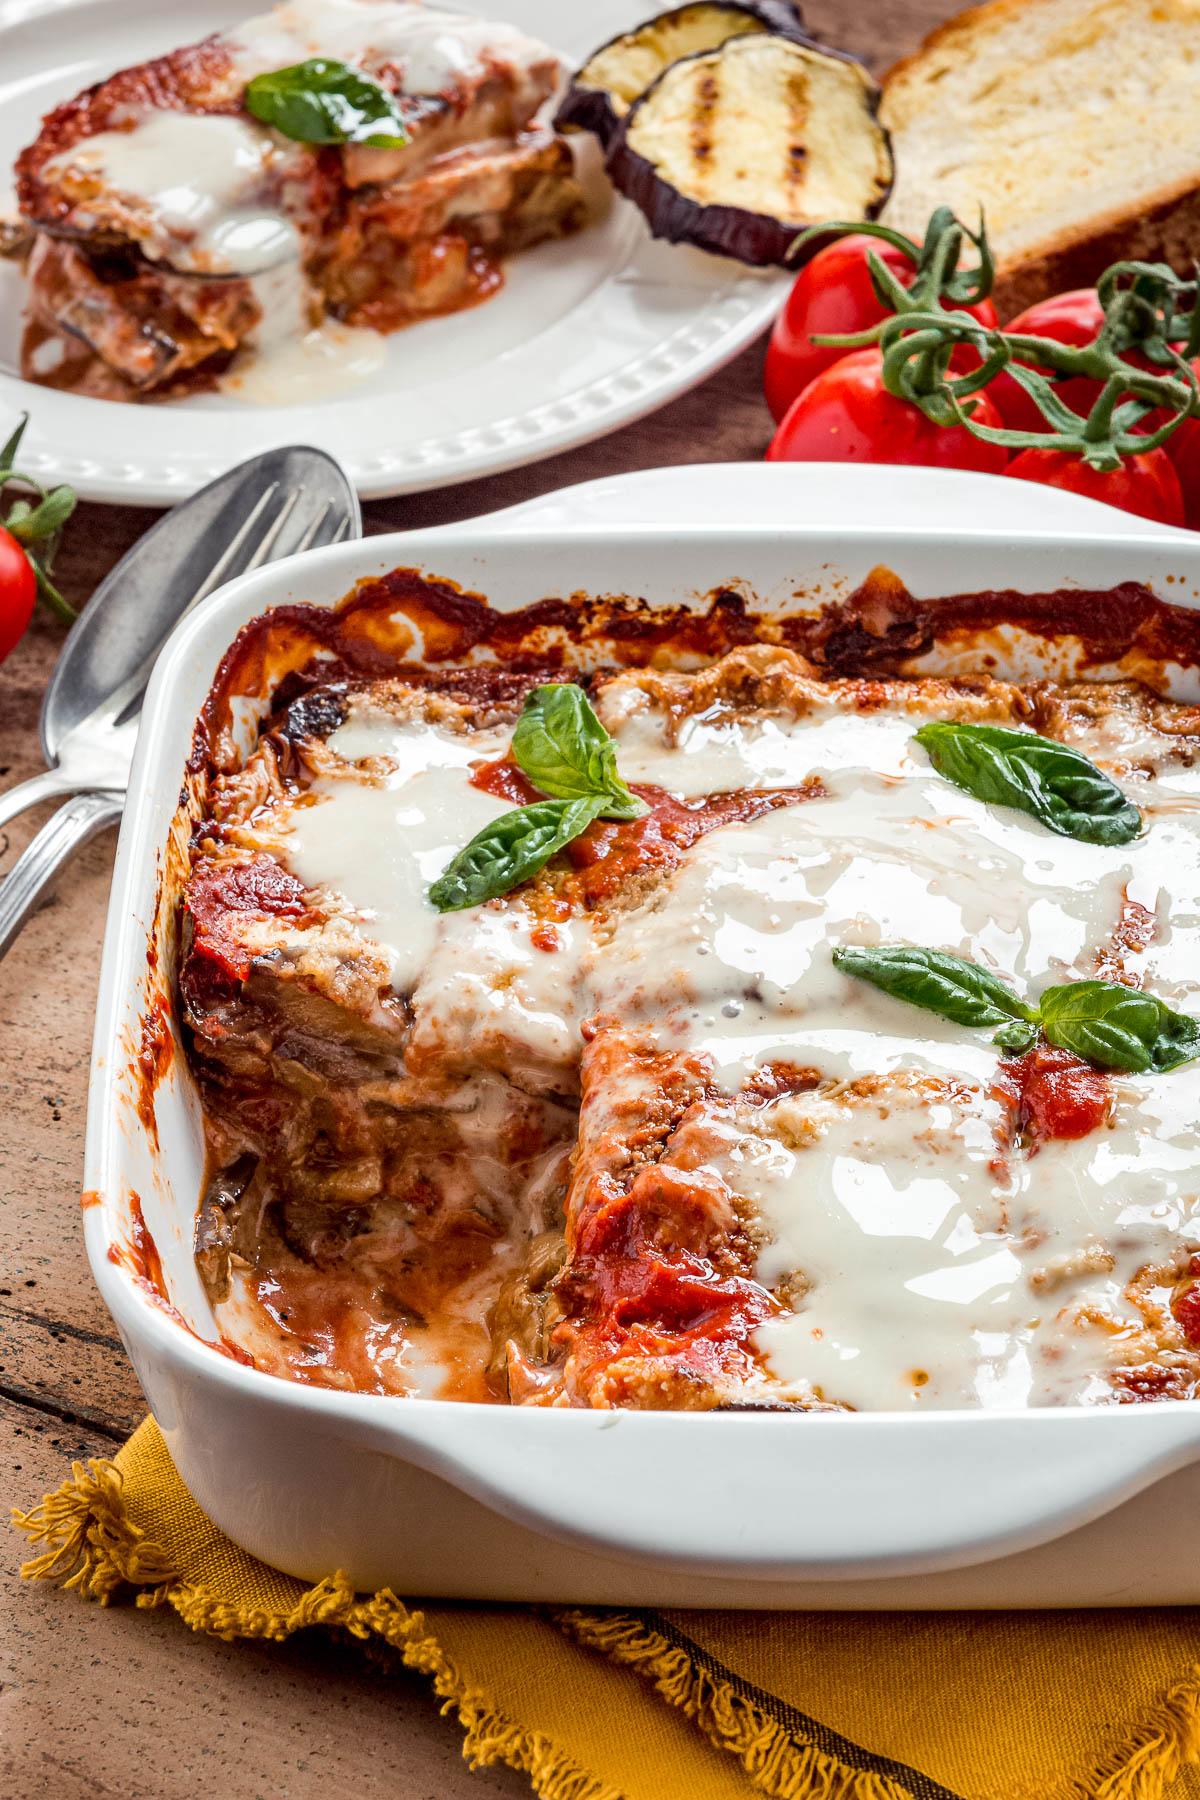 Italian Vegan EGGPLANT PARMESAN recipe with homemade vegan mozzarella ricetta MELANZANE alla PARMIGIANA VEGAN LIGHT al FORNO con mozzarella vegan fatta in casa e parmigiano veg